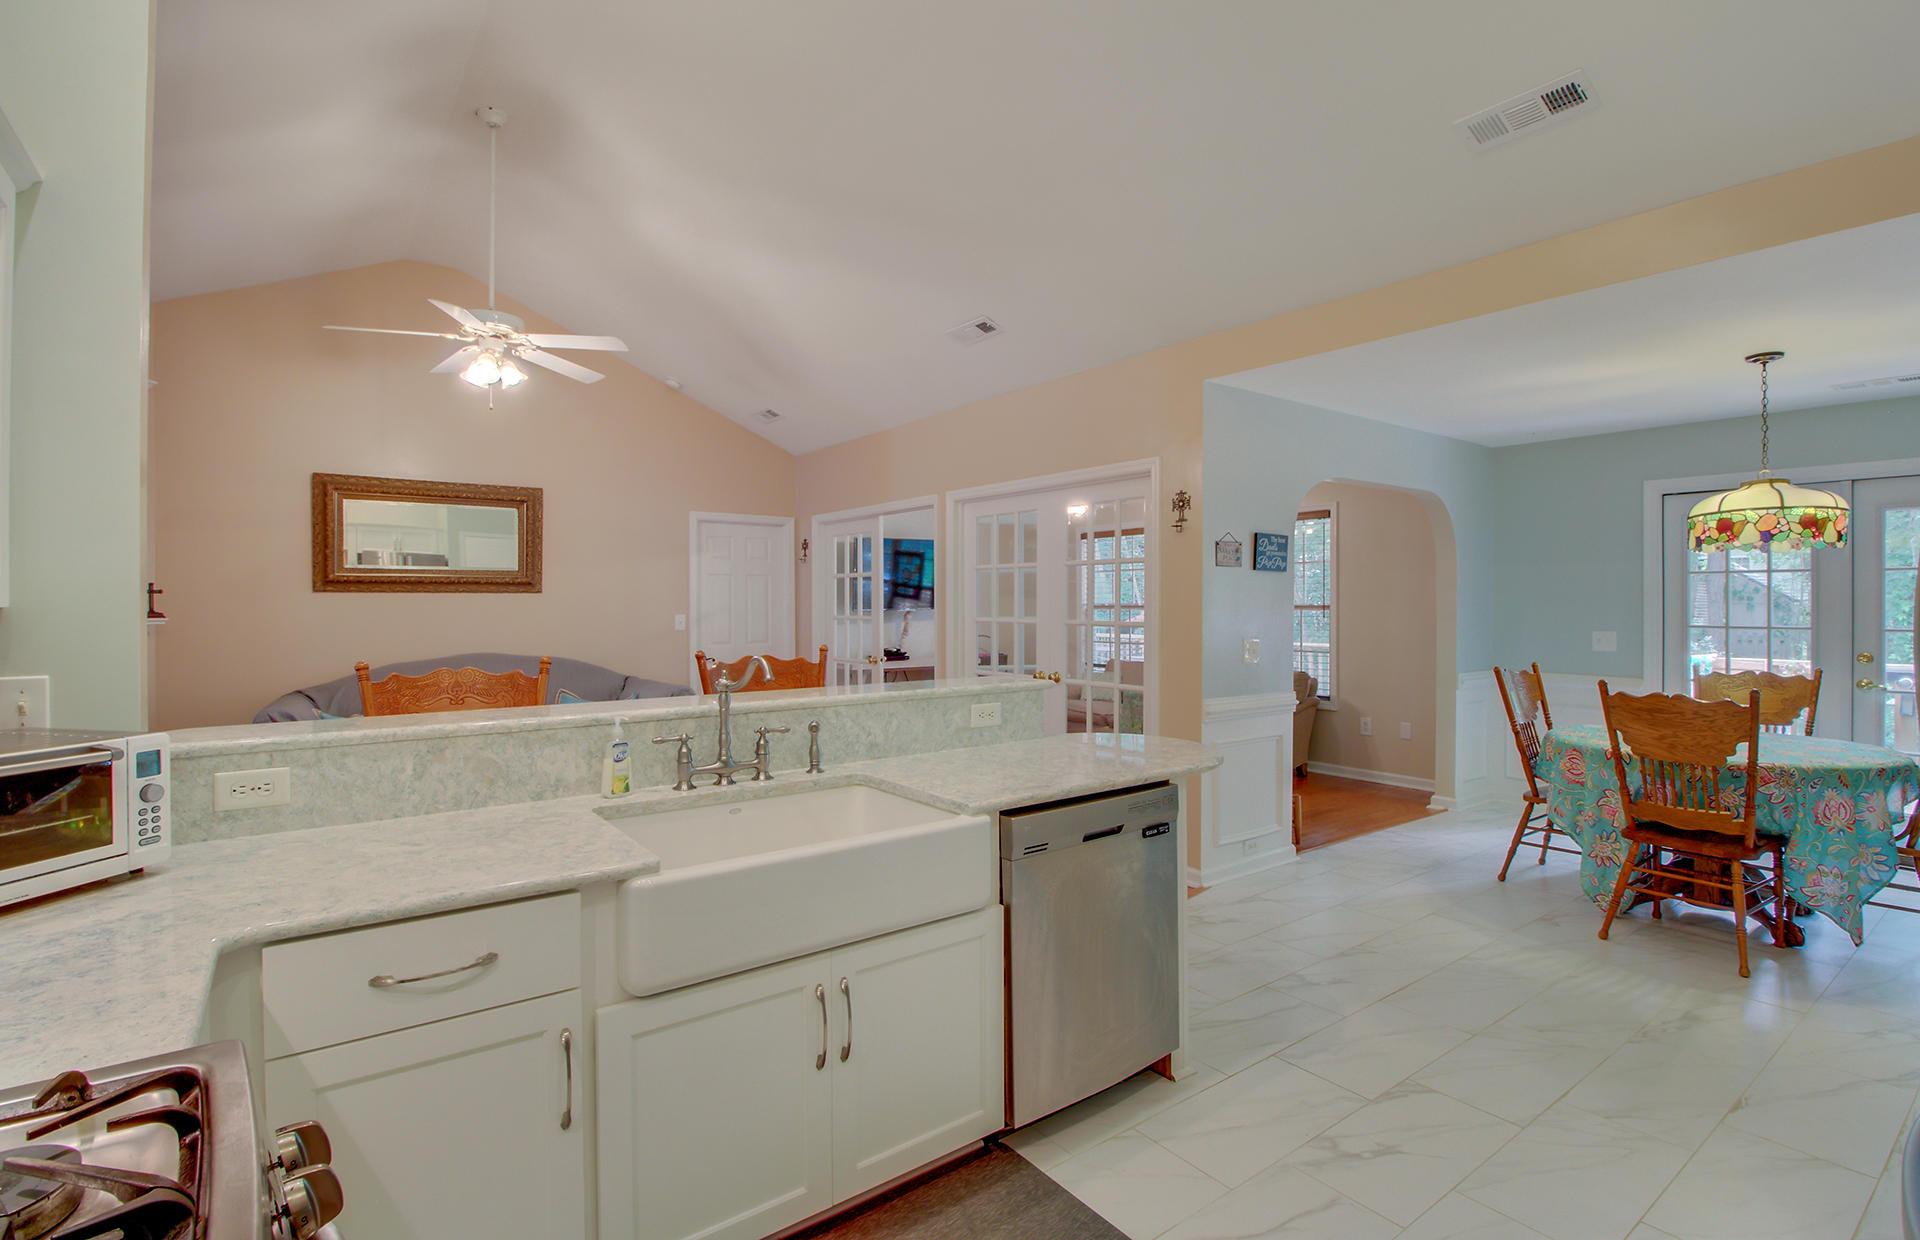 Park West Homes For Sale - 1500 Wellesley, Mount Pleasant, SC - 29